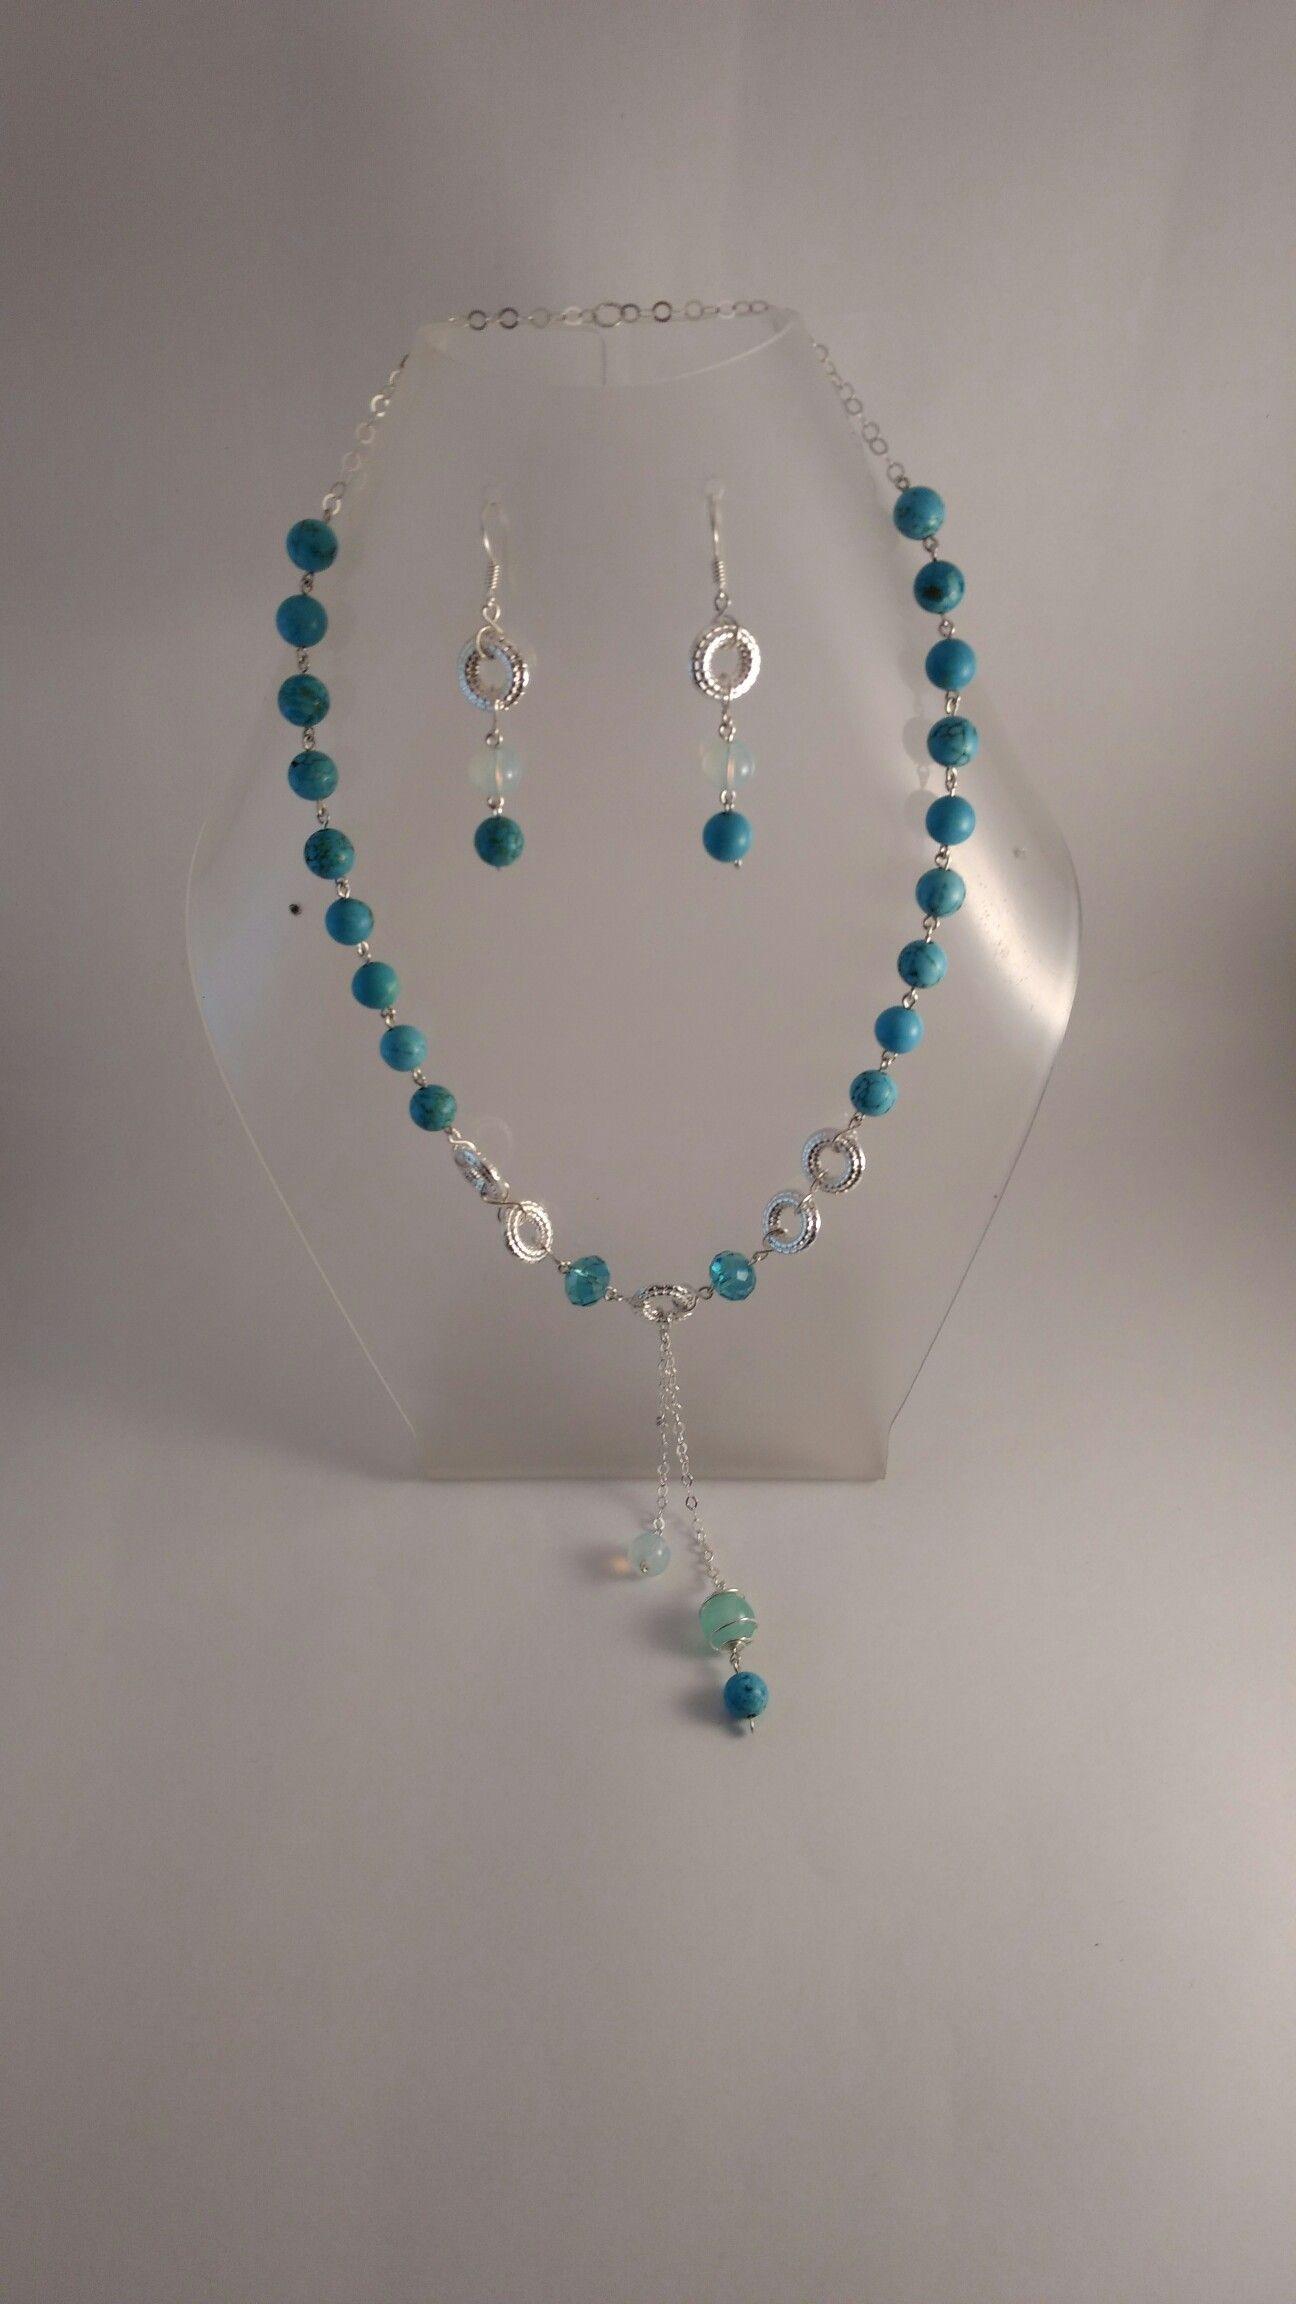 eb5406da544f Collar de plata cristales turquesa y rayo de luna